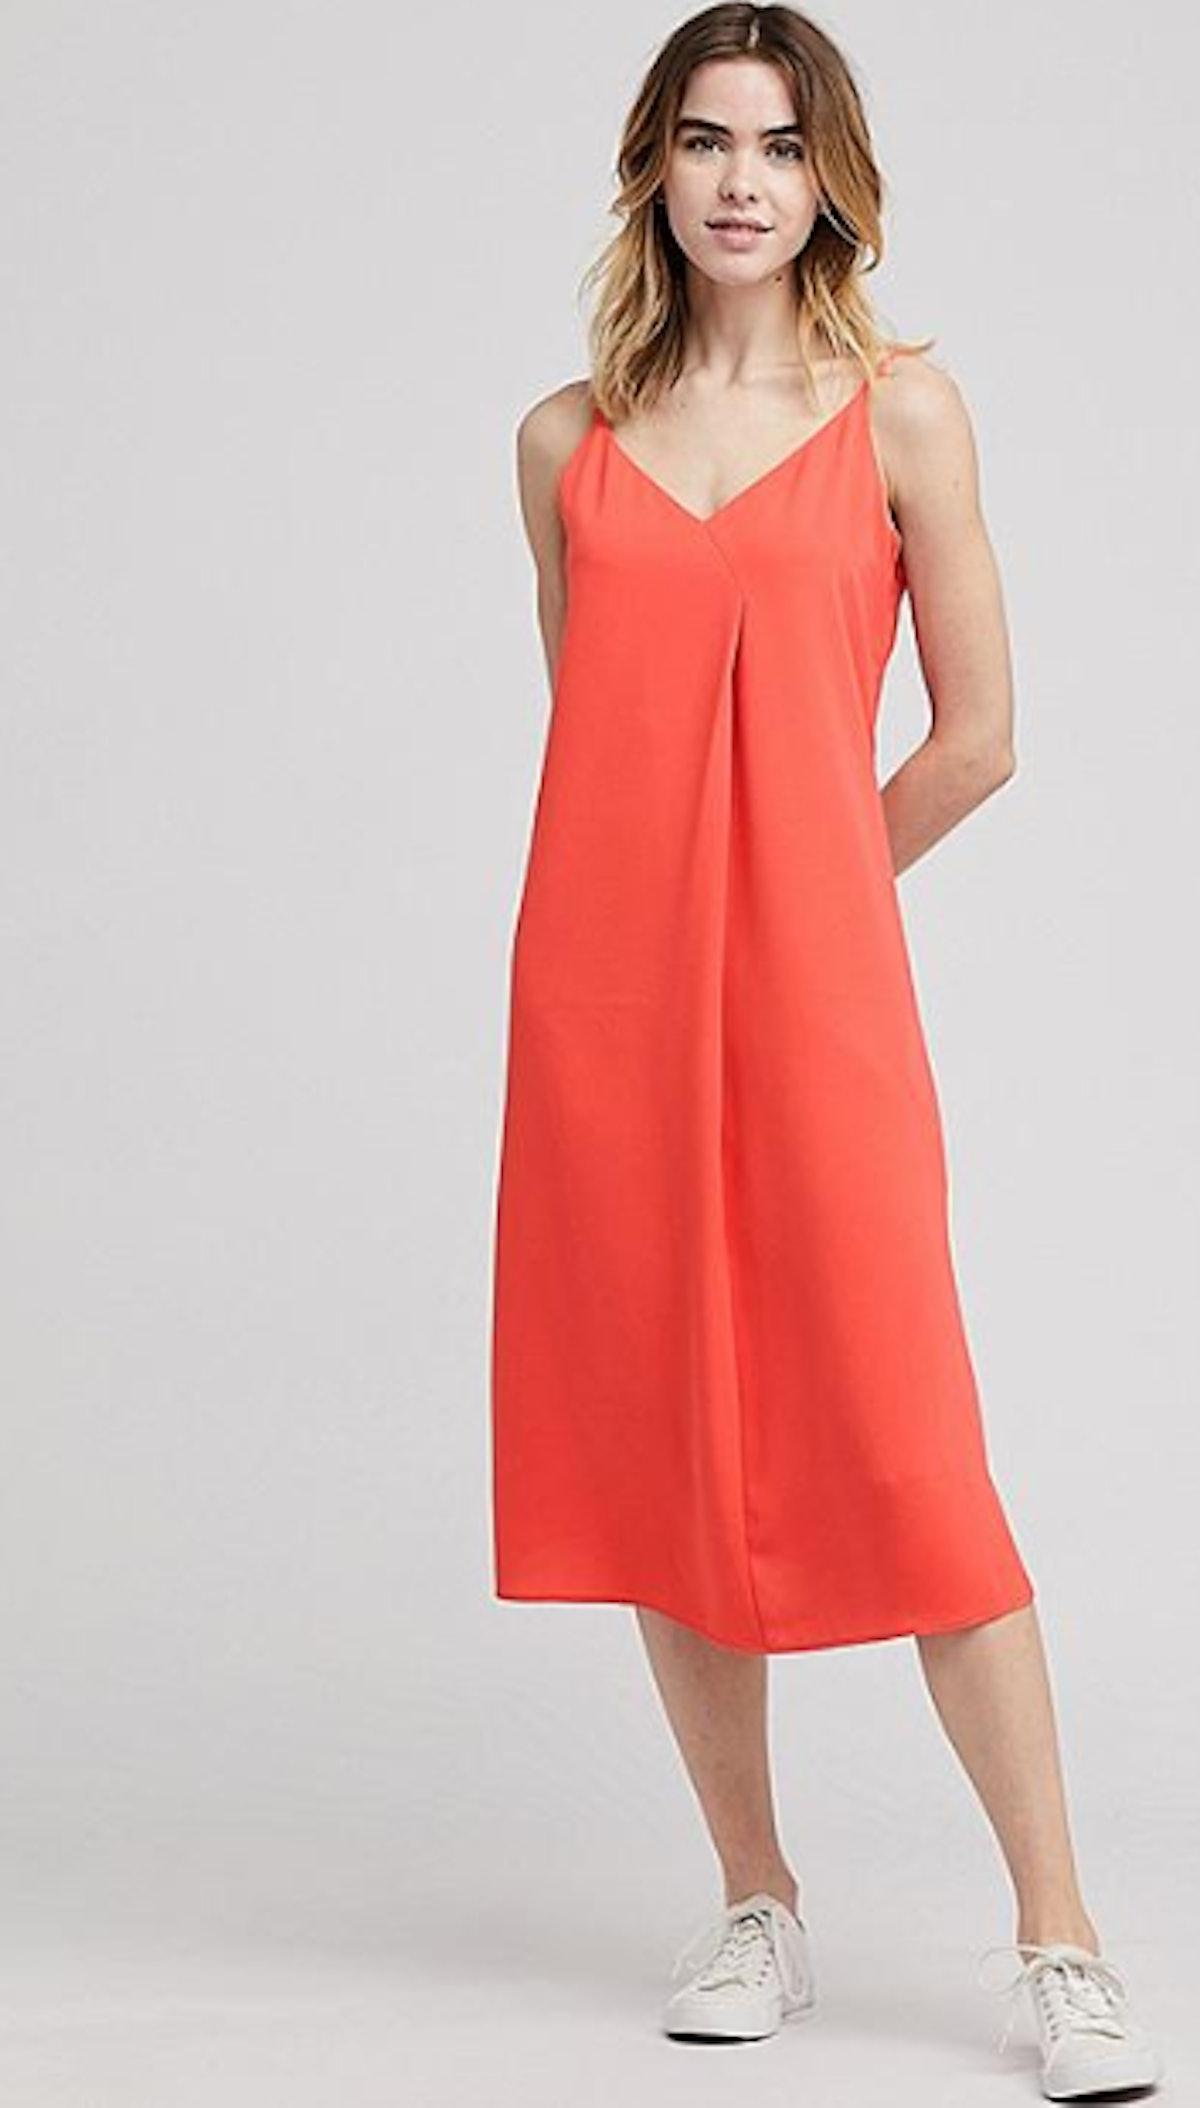 Women Drape Cami Dress